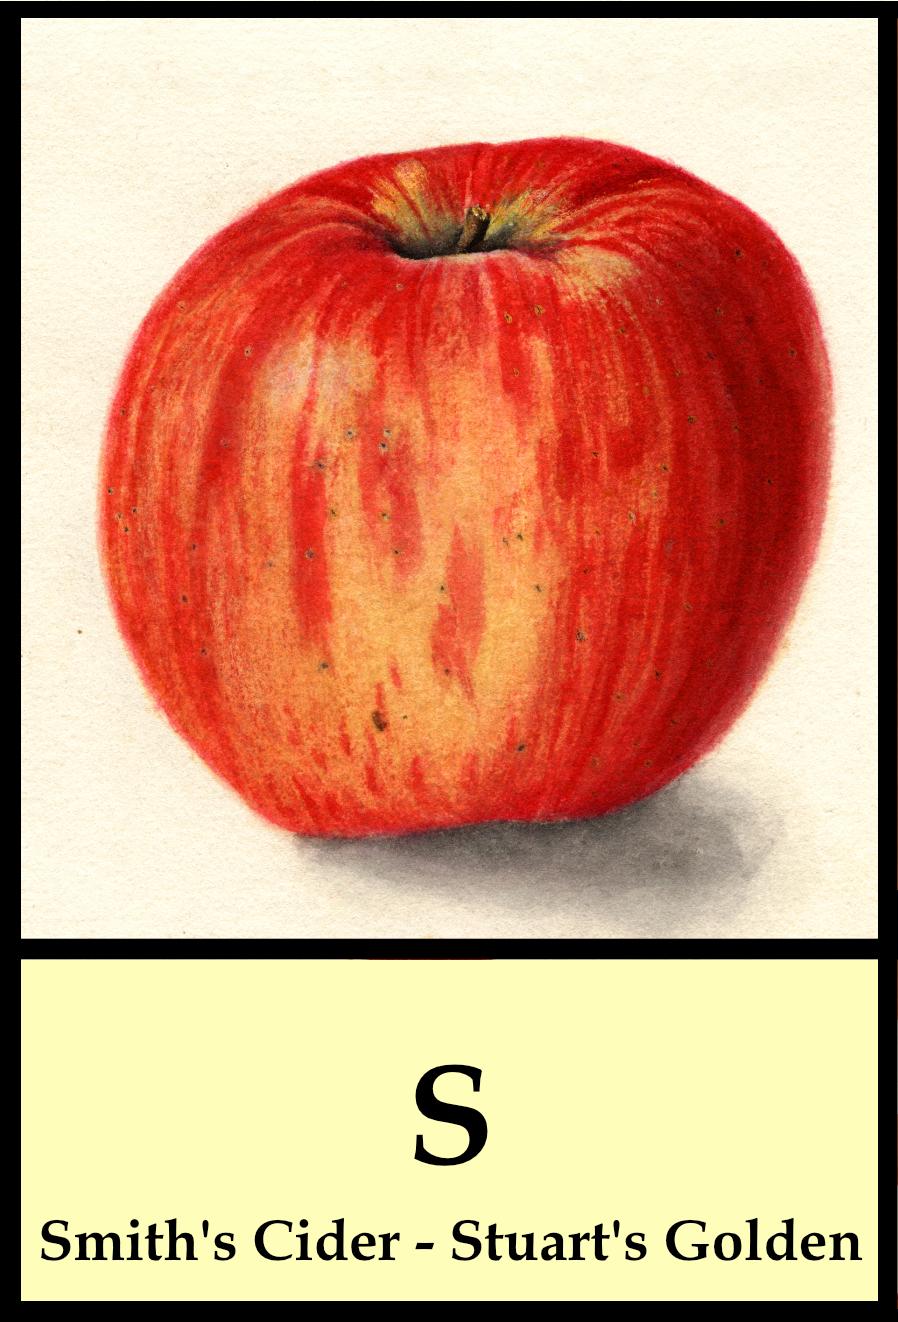 S apples - Smith's Cider to Stuart's Golden